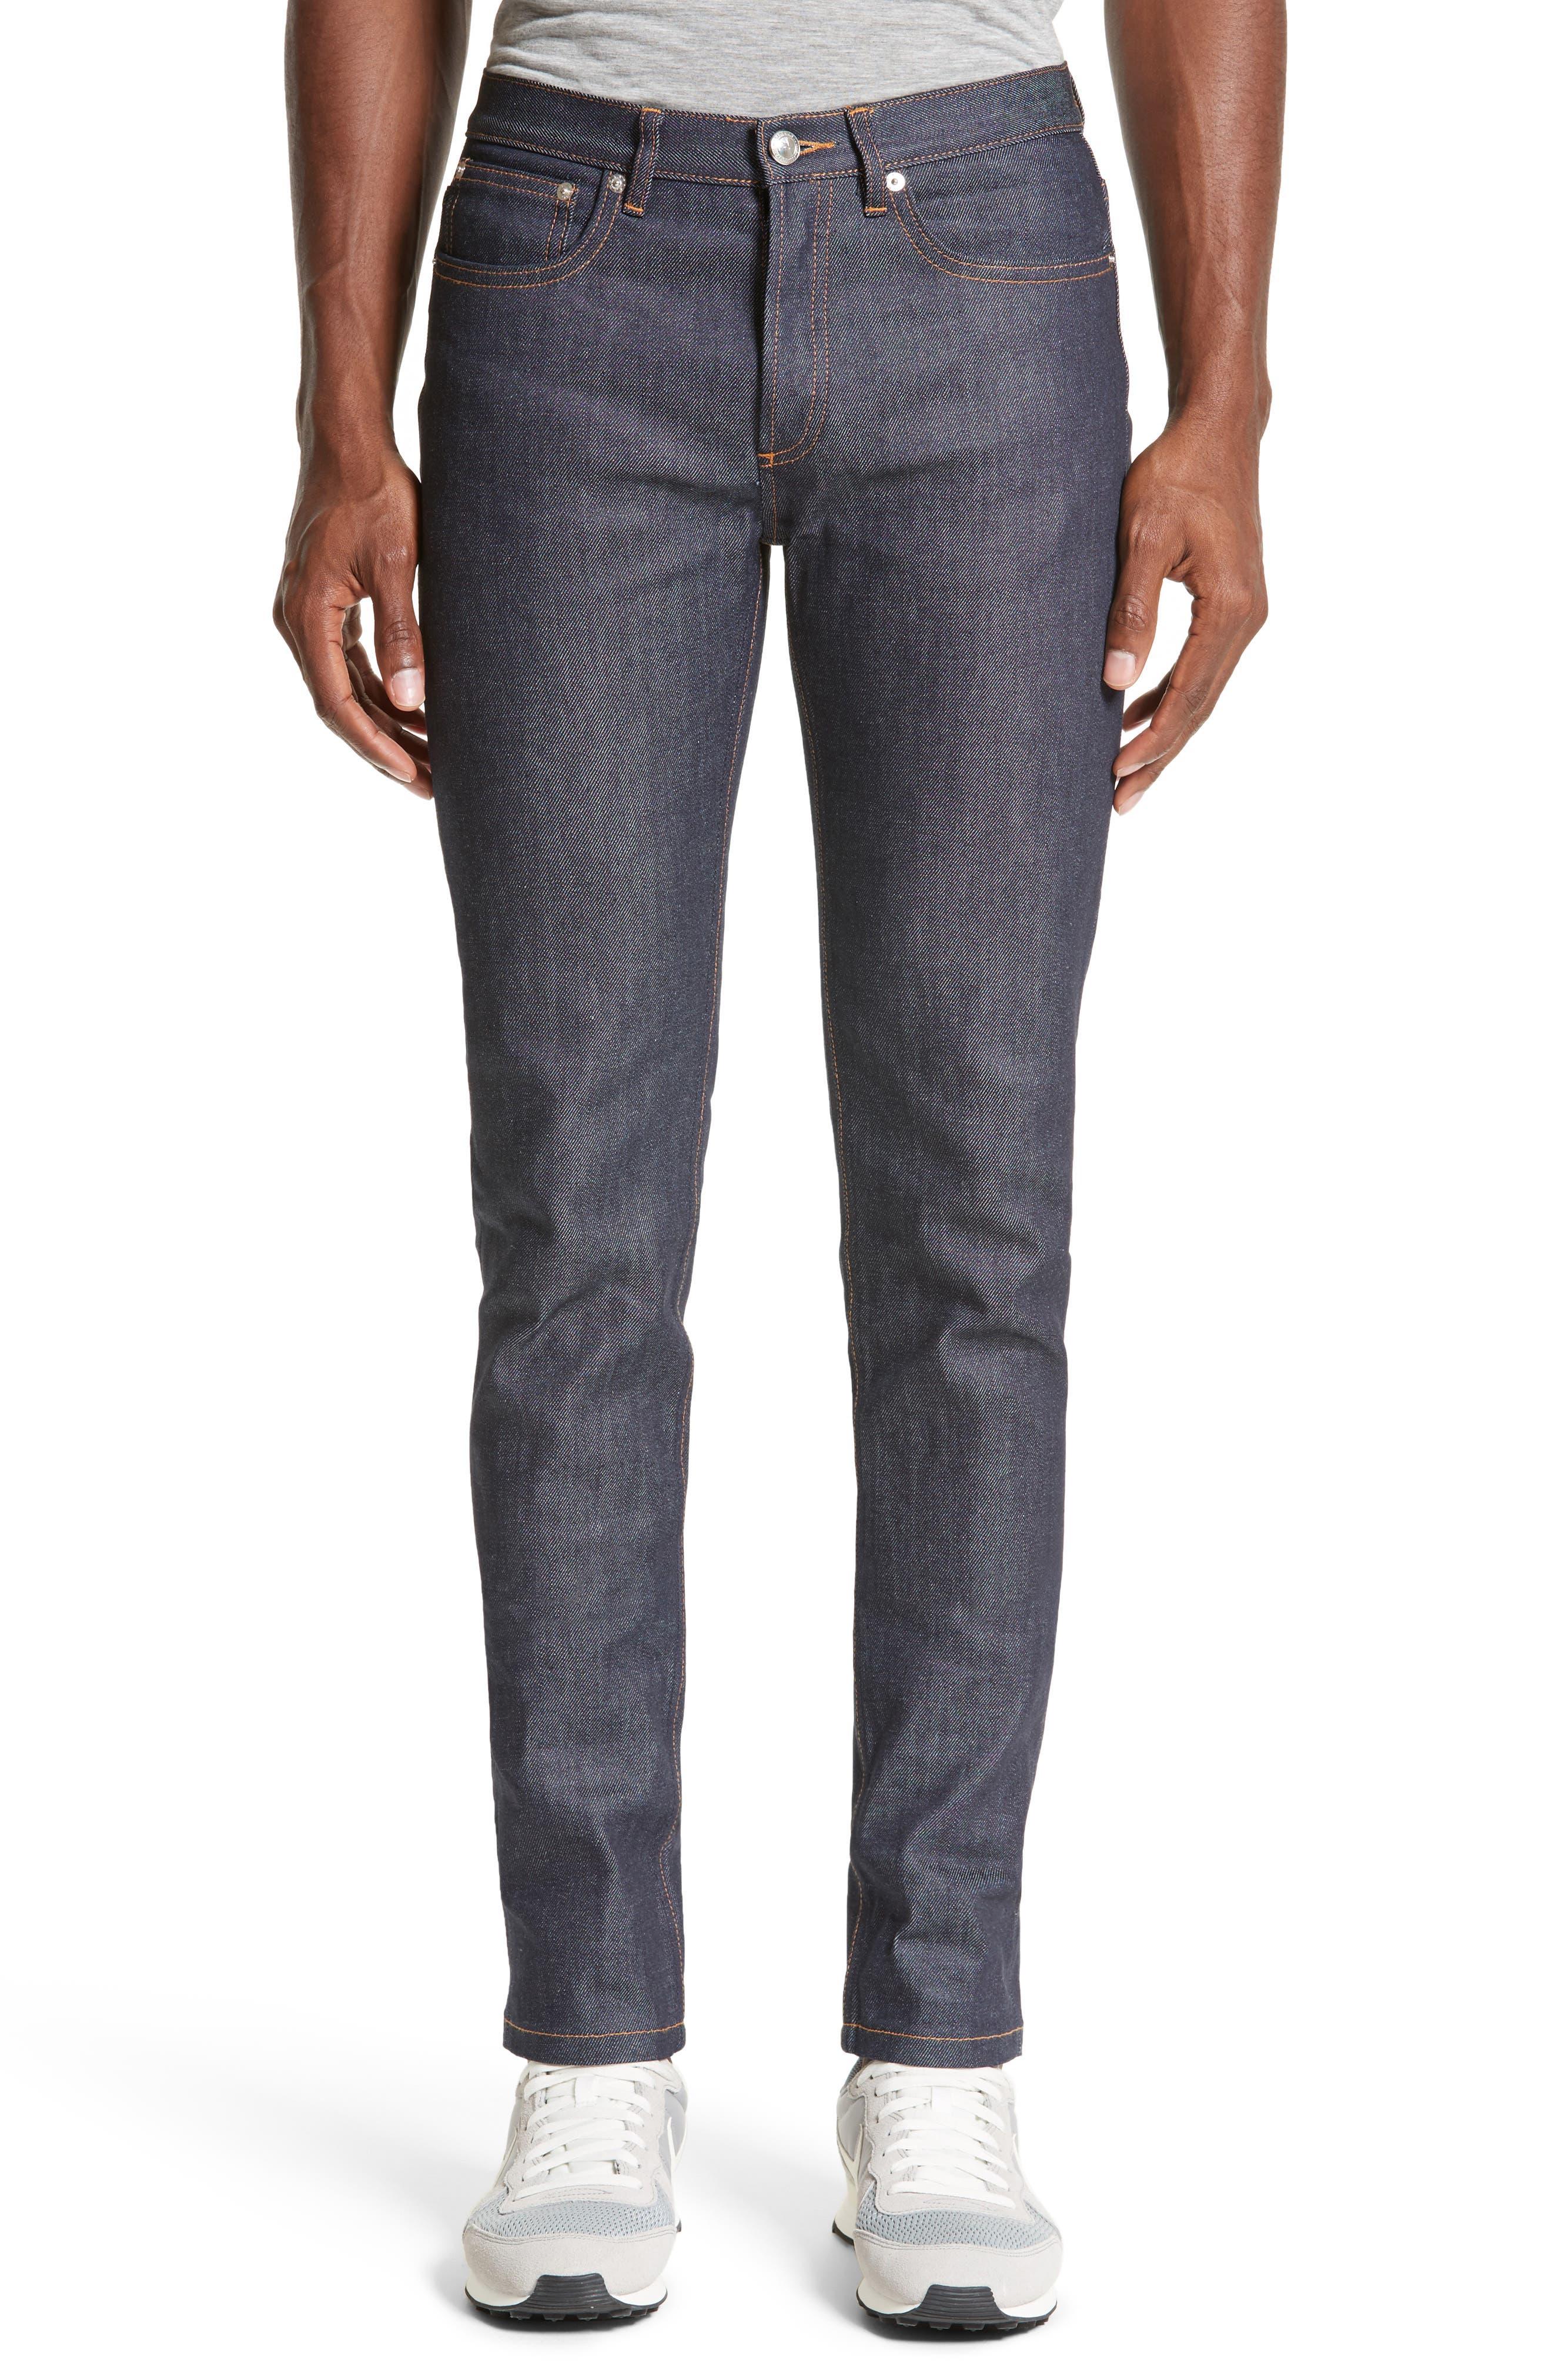 A.P.C. Petit Standard Stretch Skinny Fit Jeans